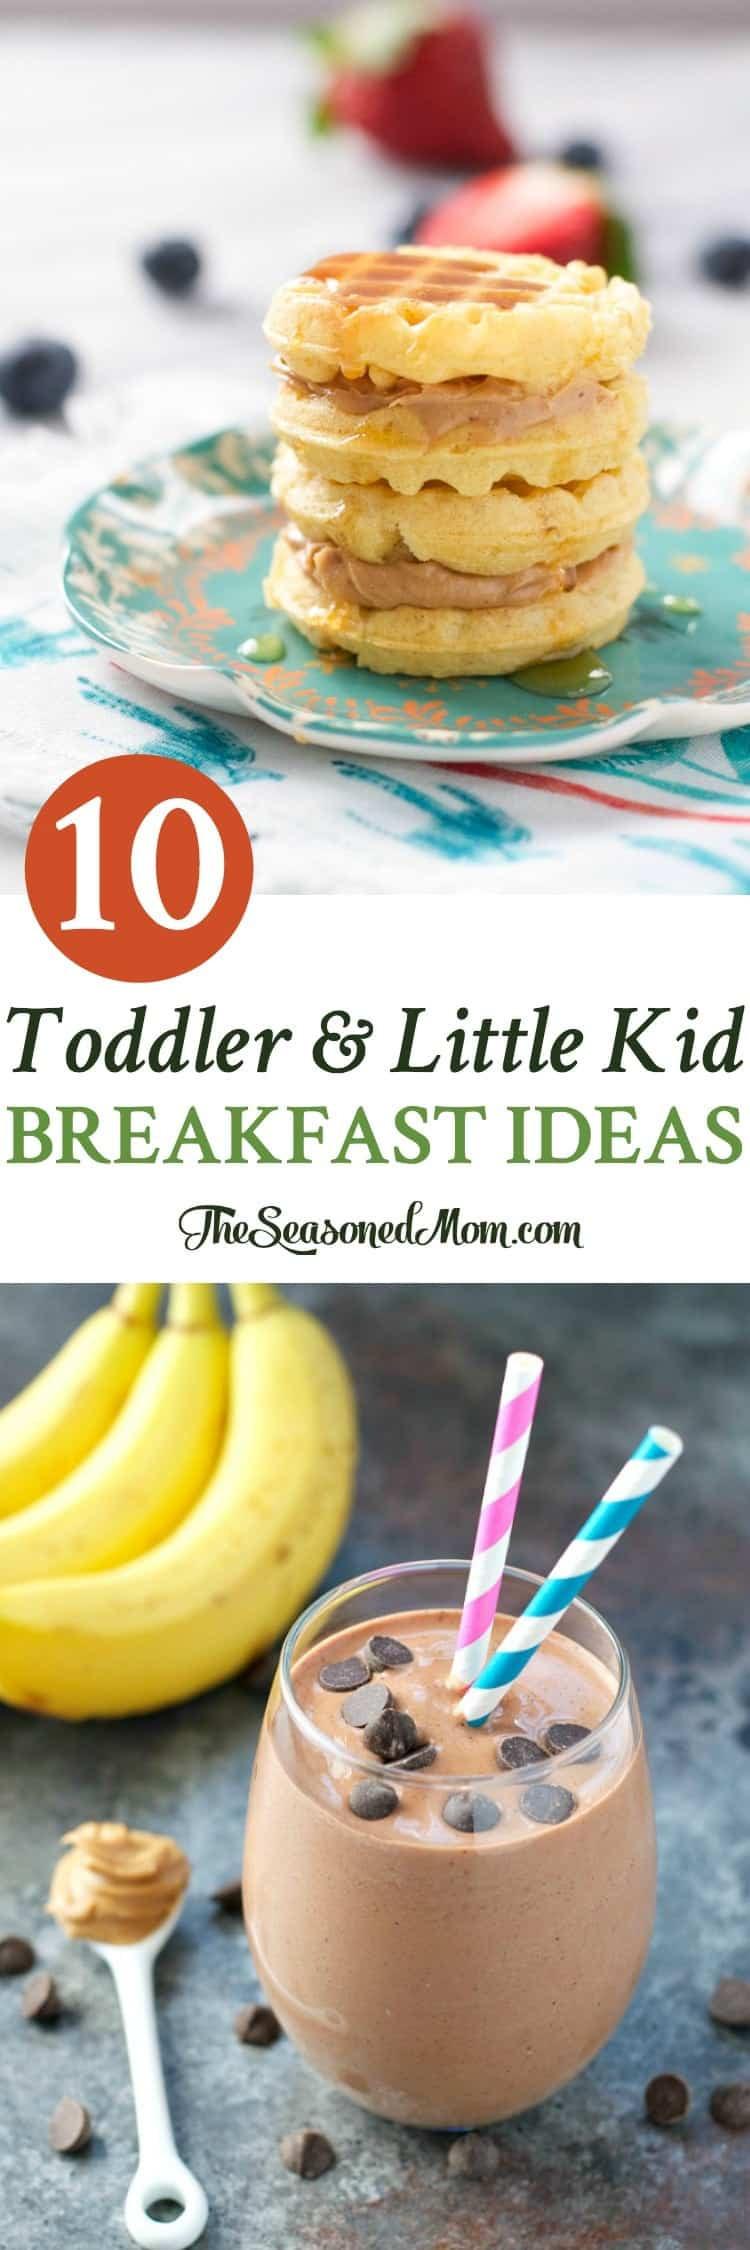 Healthy Breakfast Recipes For Kids  10 Toddler and Little Kid Breakfast Ideas The Seasoned Mom